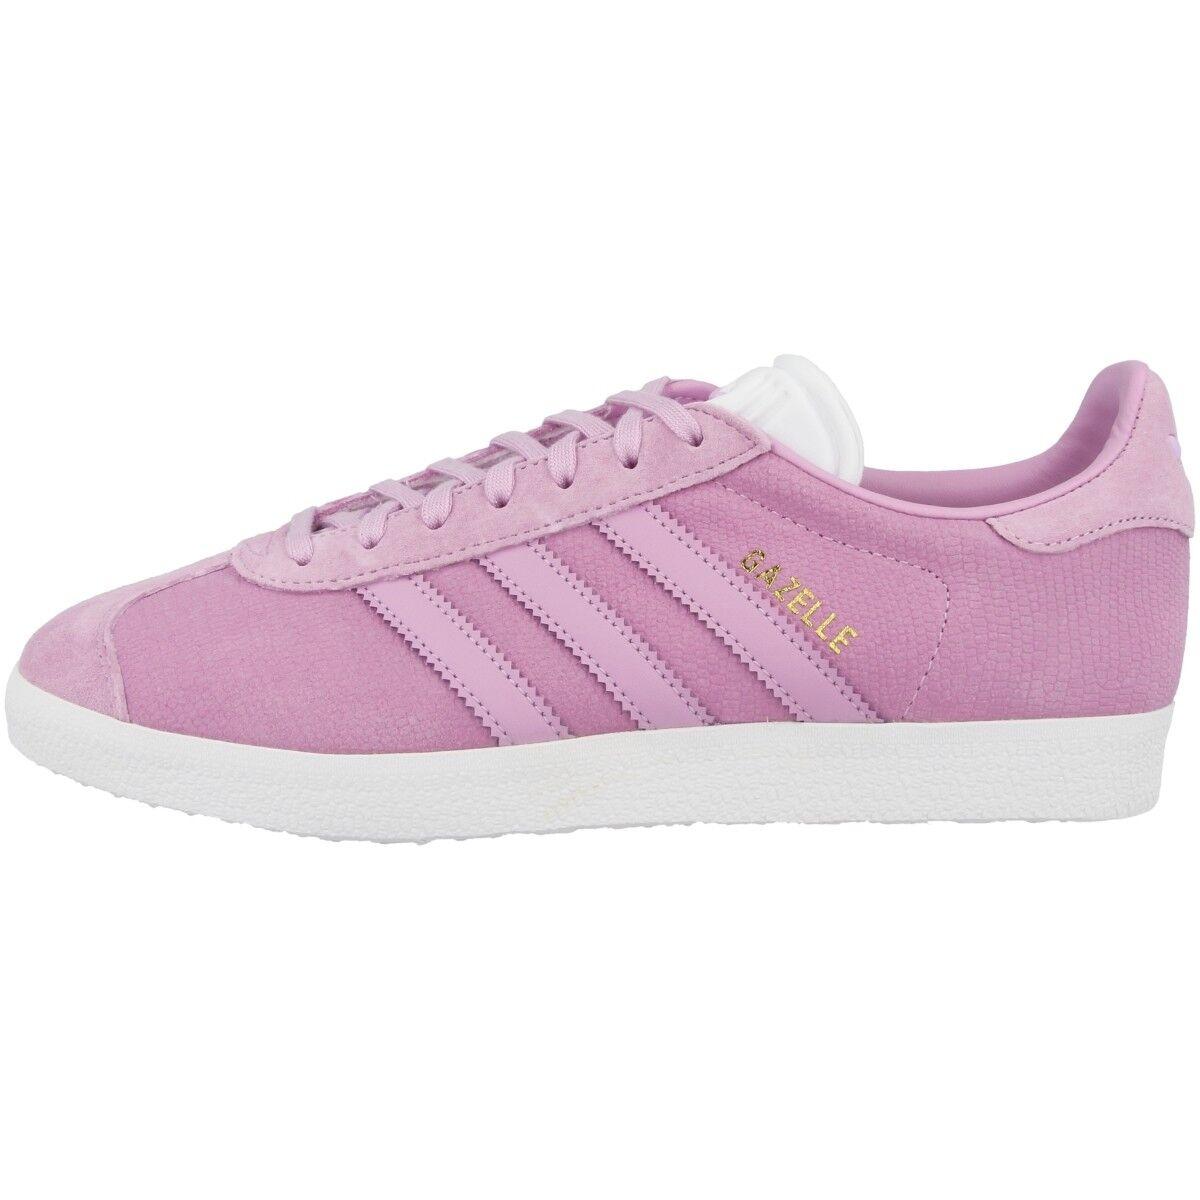 am beliebtesten-Adidas Gazelle damen Schuhe Damen Originals ...